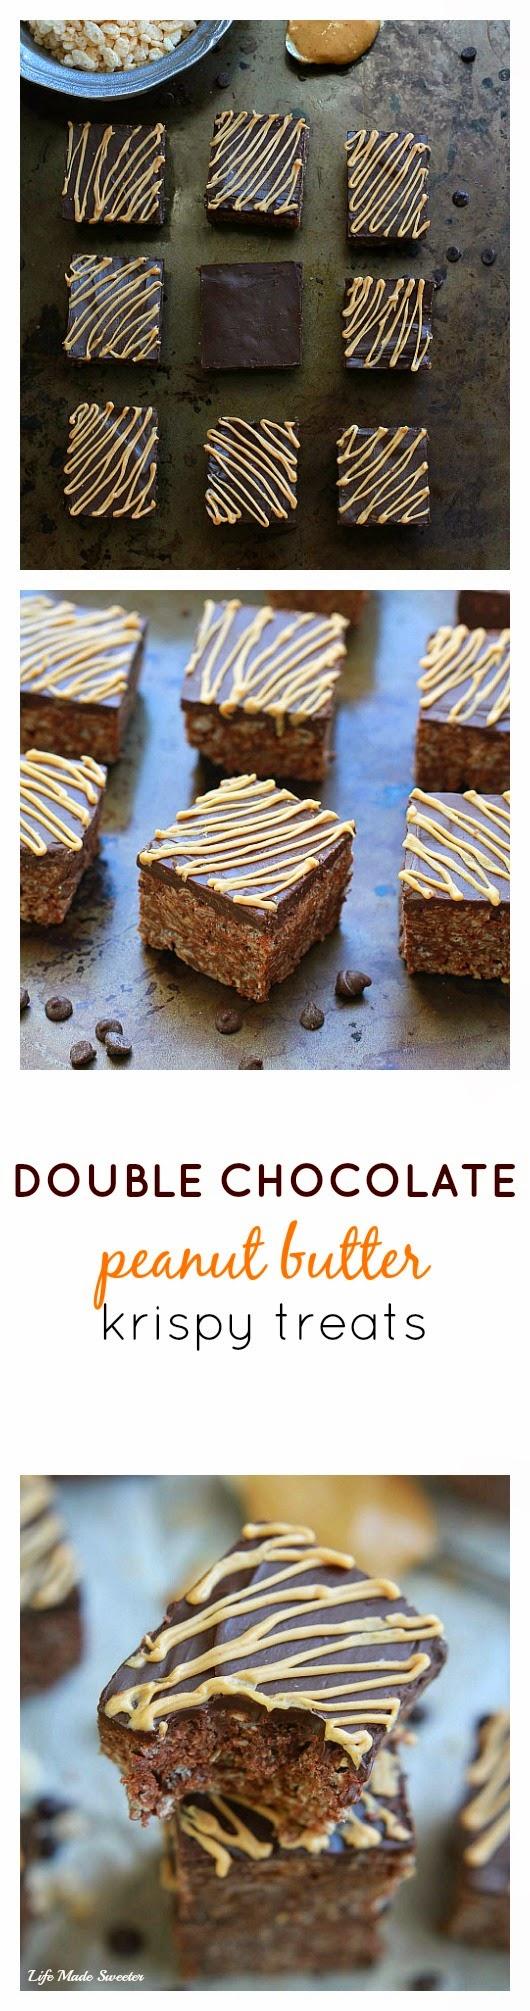 Double Chocolate Peanut Butter Krispy Treats via - - @LifeMadeSweeter.jpg